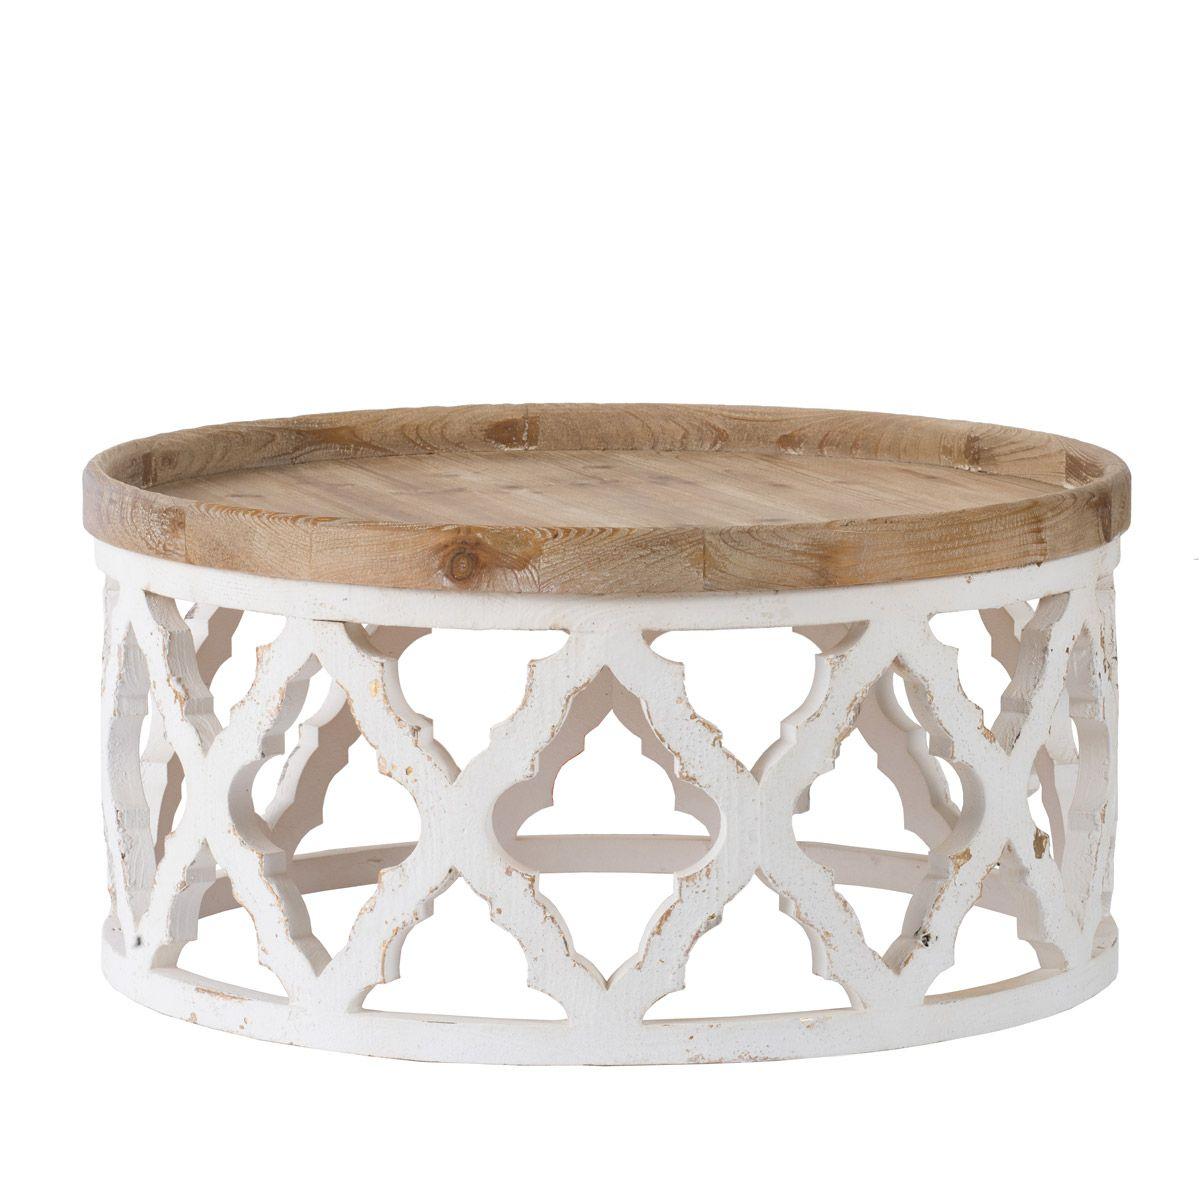 A B Home 45109 Anita 32 Inch Weathered White Coffee Table In 2021 Coffee Table Wood Coffee Table White Round Wooden Coffee Table [ 1200 x 1200 Pixel ]